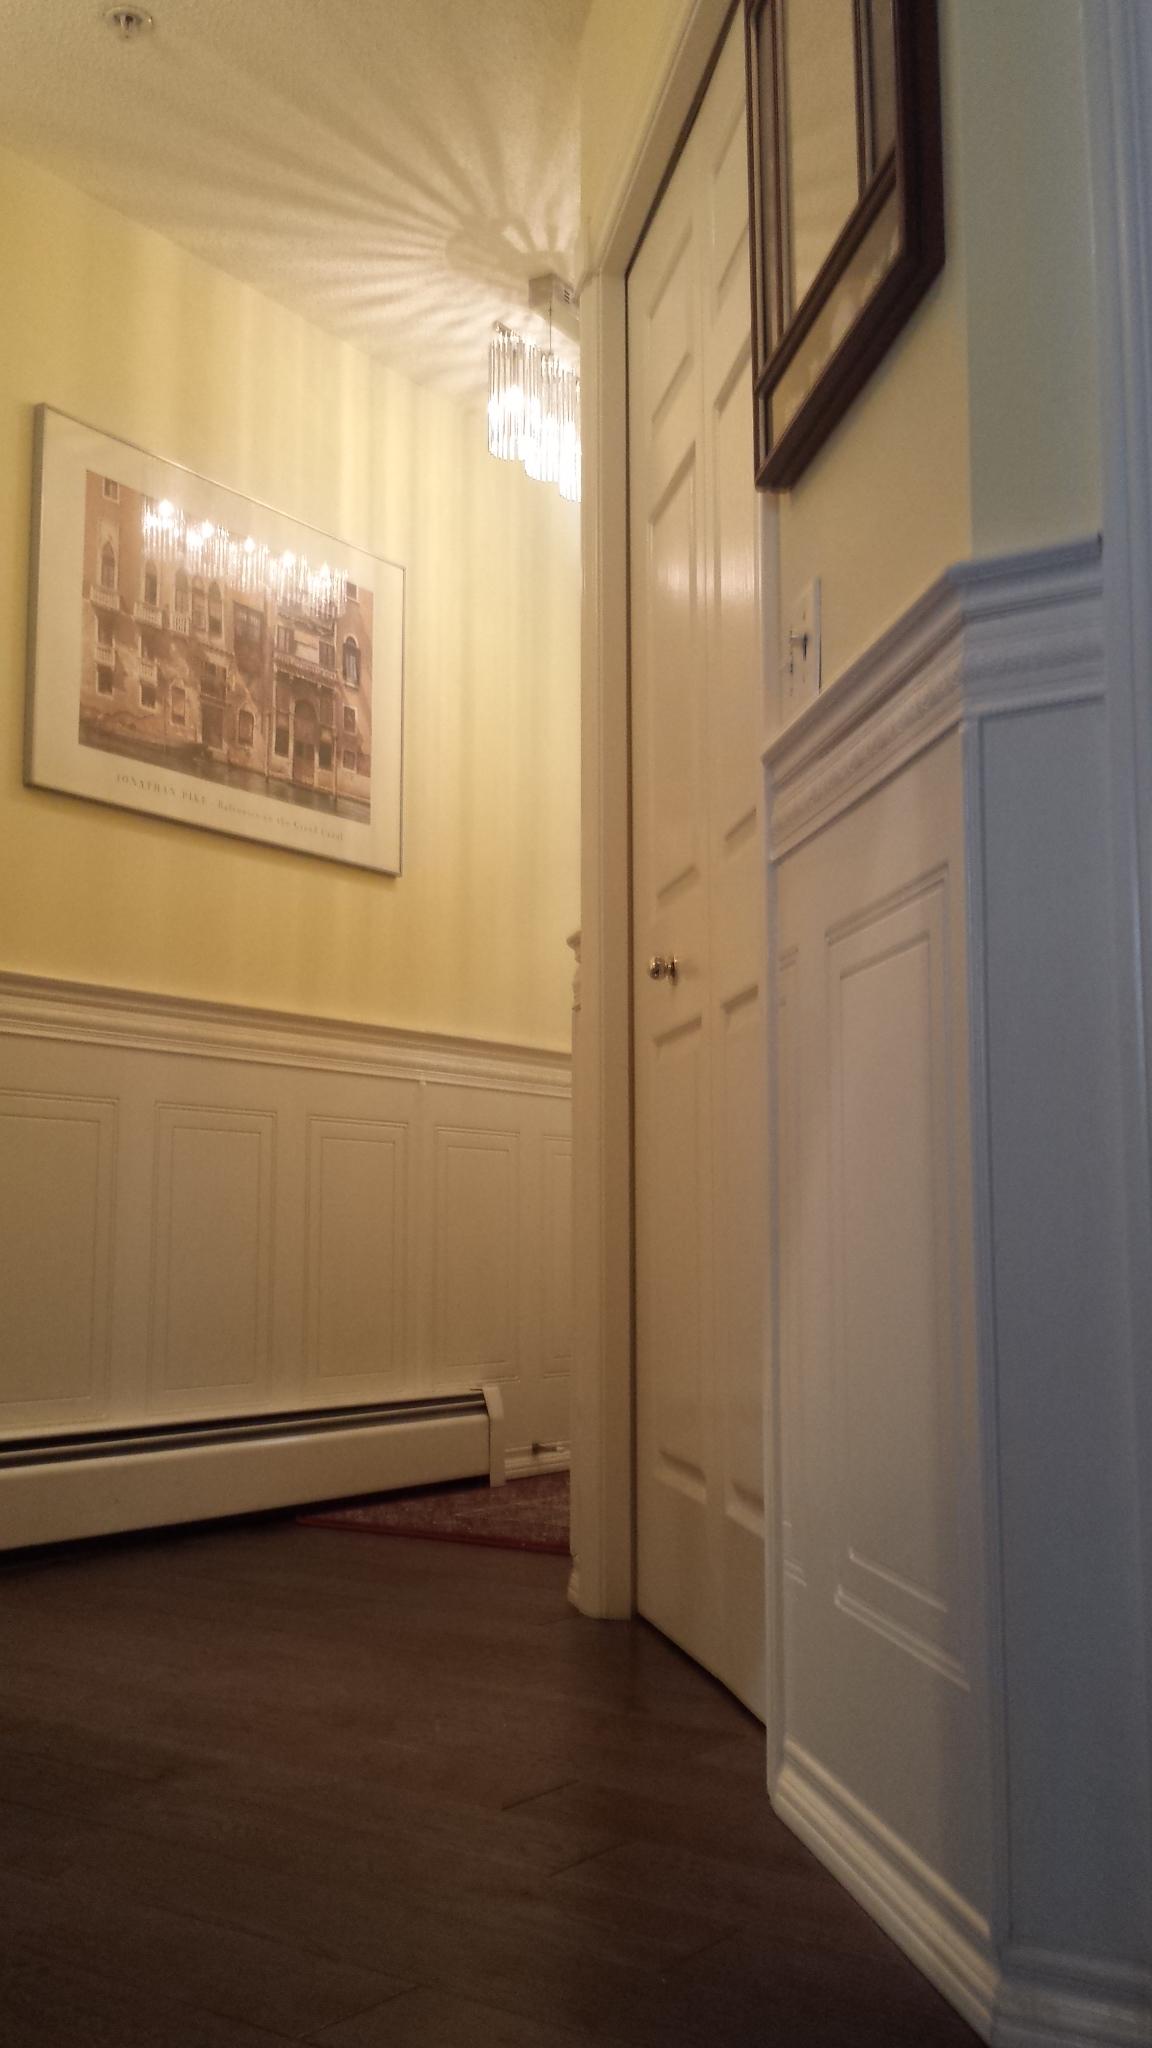 Unit 204 - Hallway 4